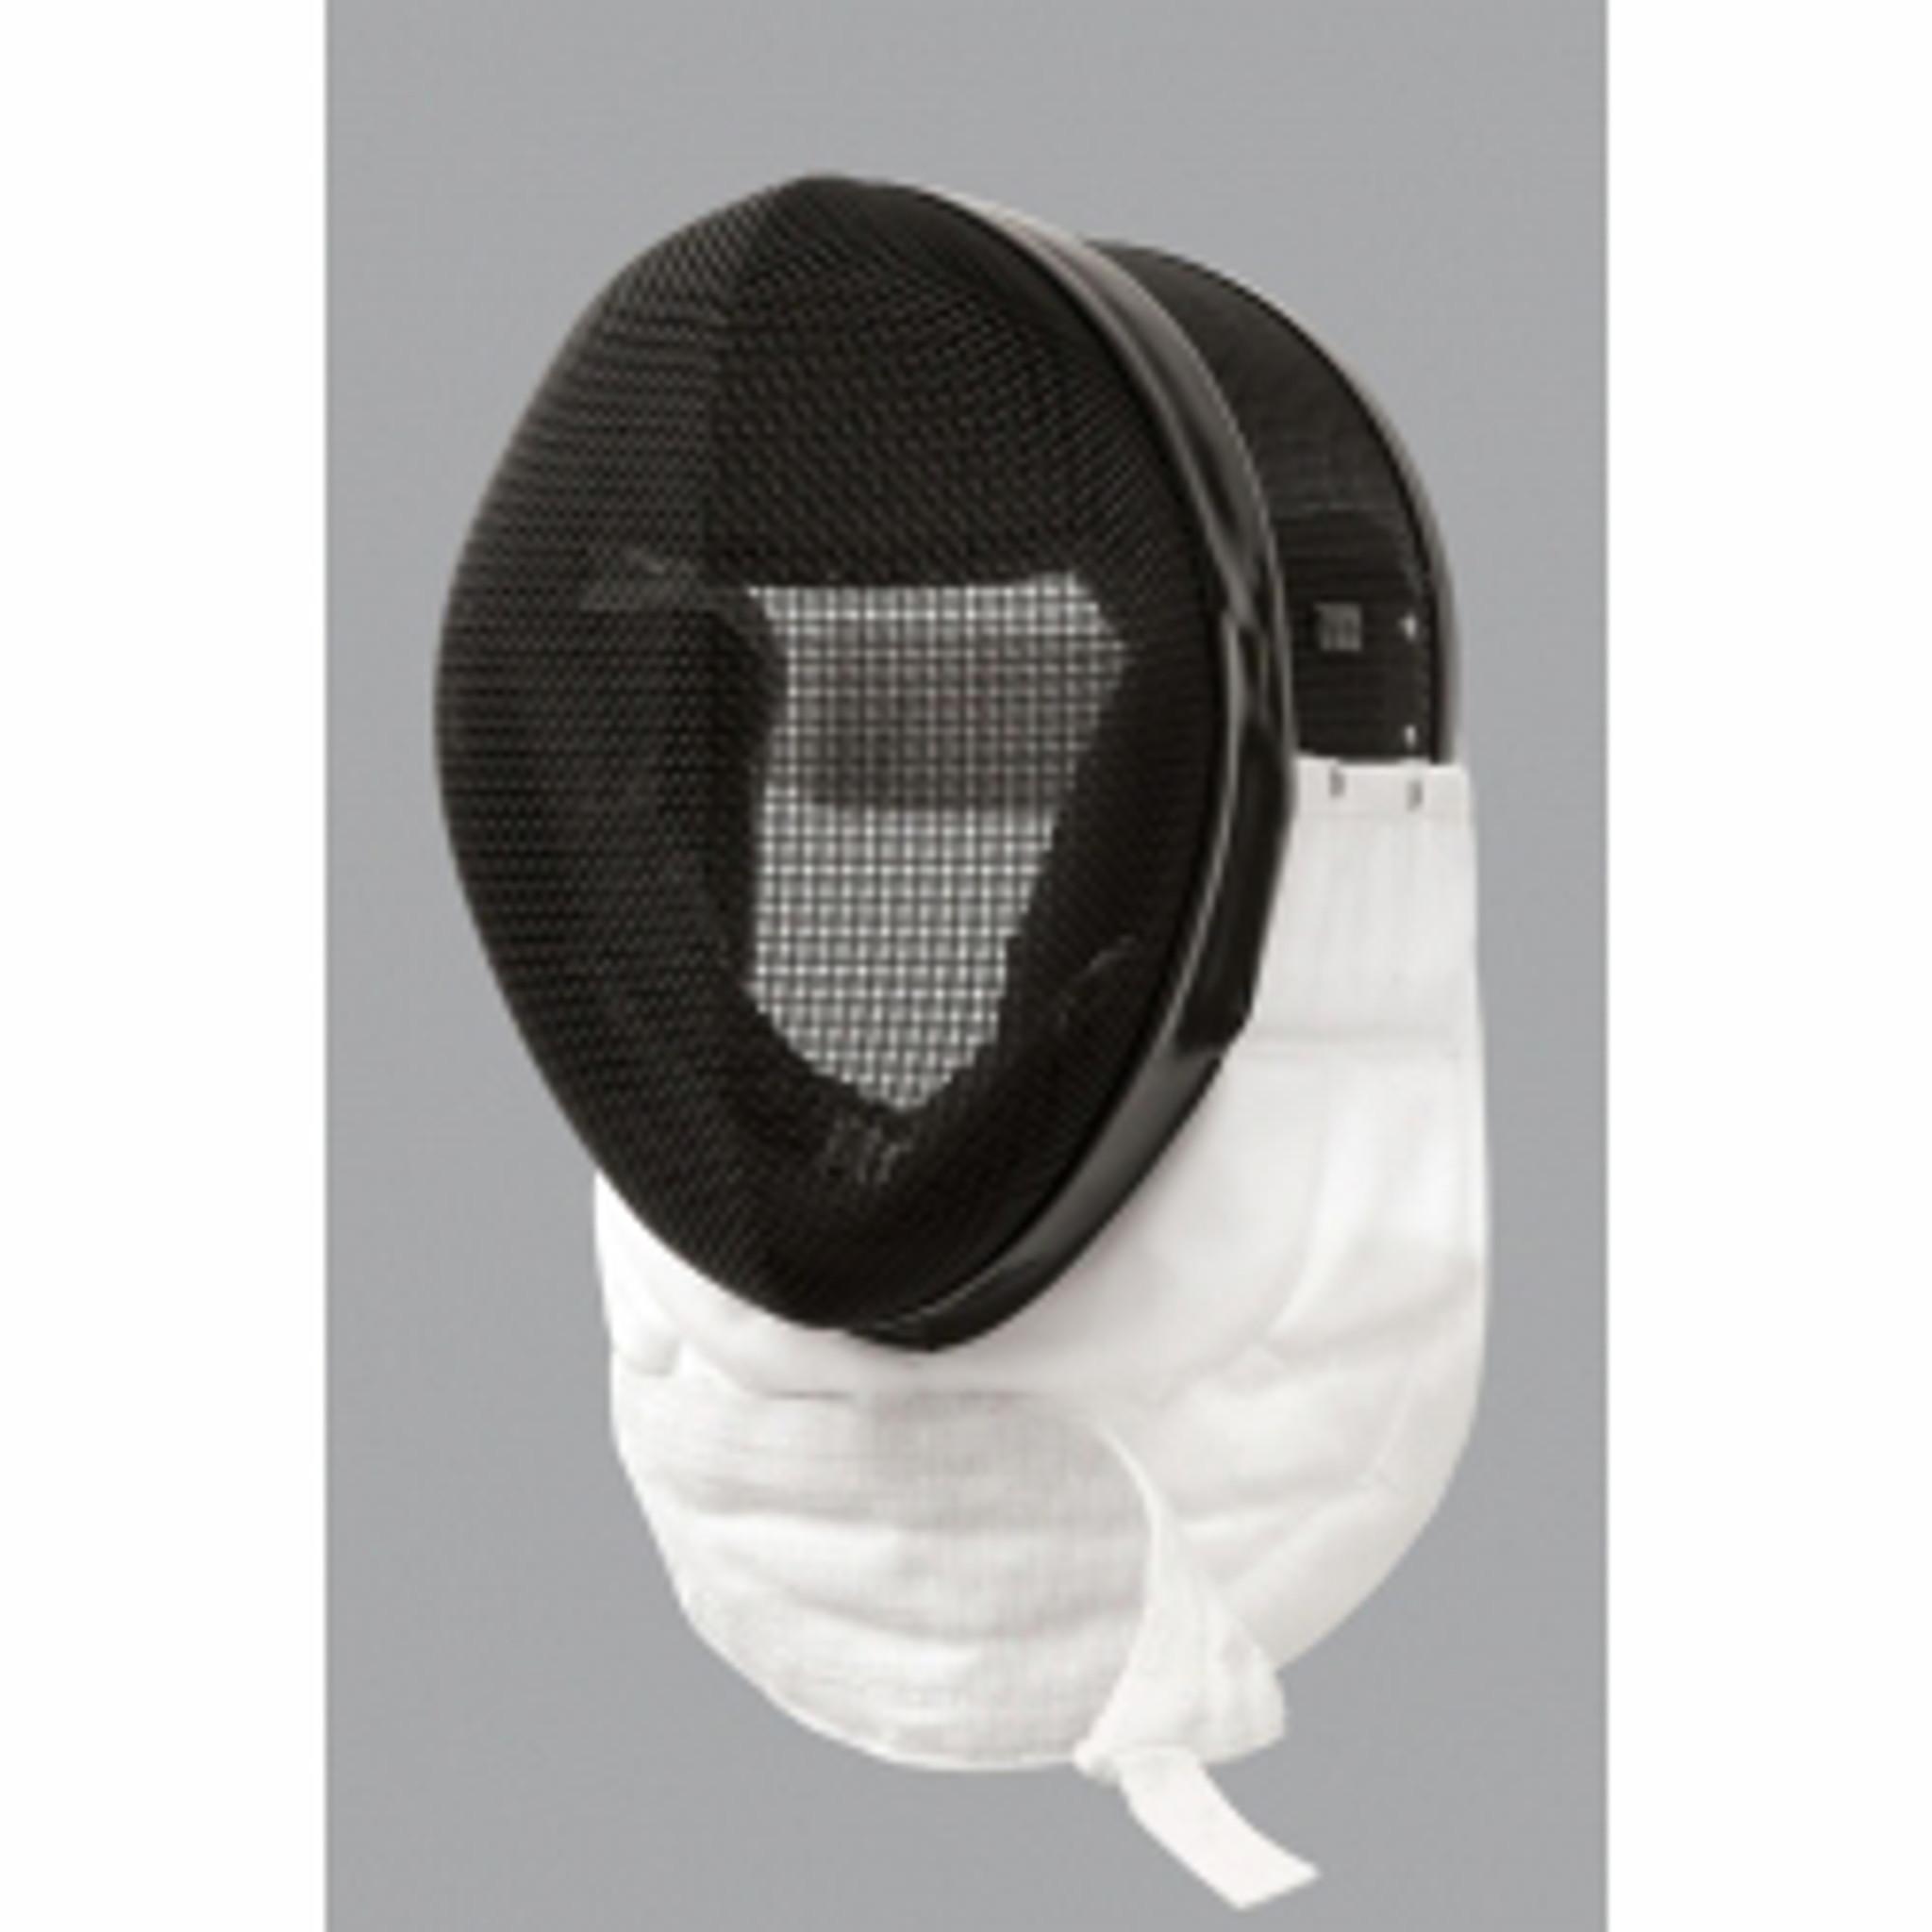 Pbt Fie Combi Foil Epee Mask 2018 Fie Standard